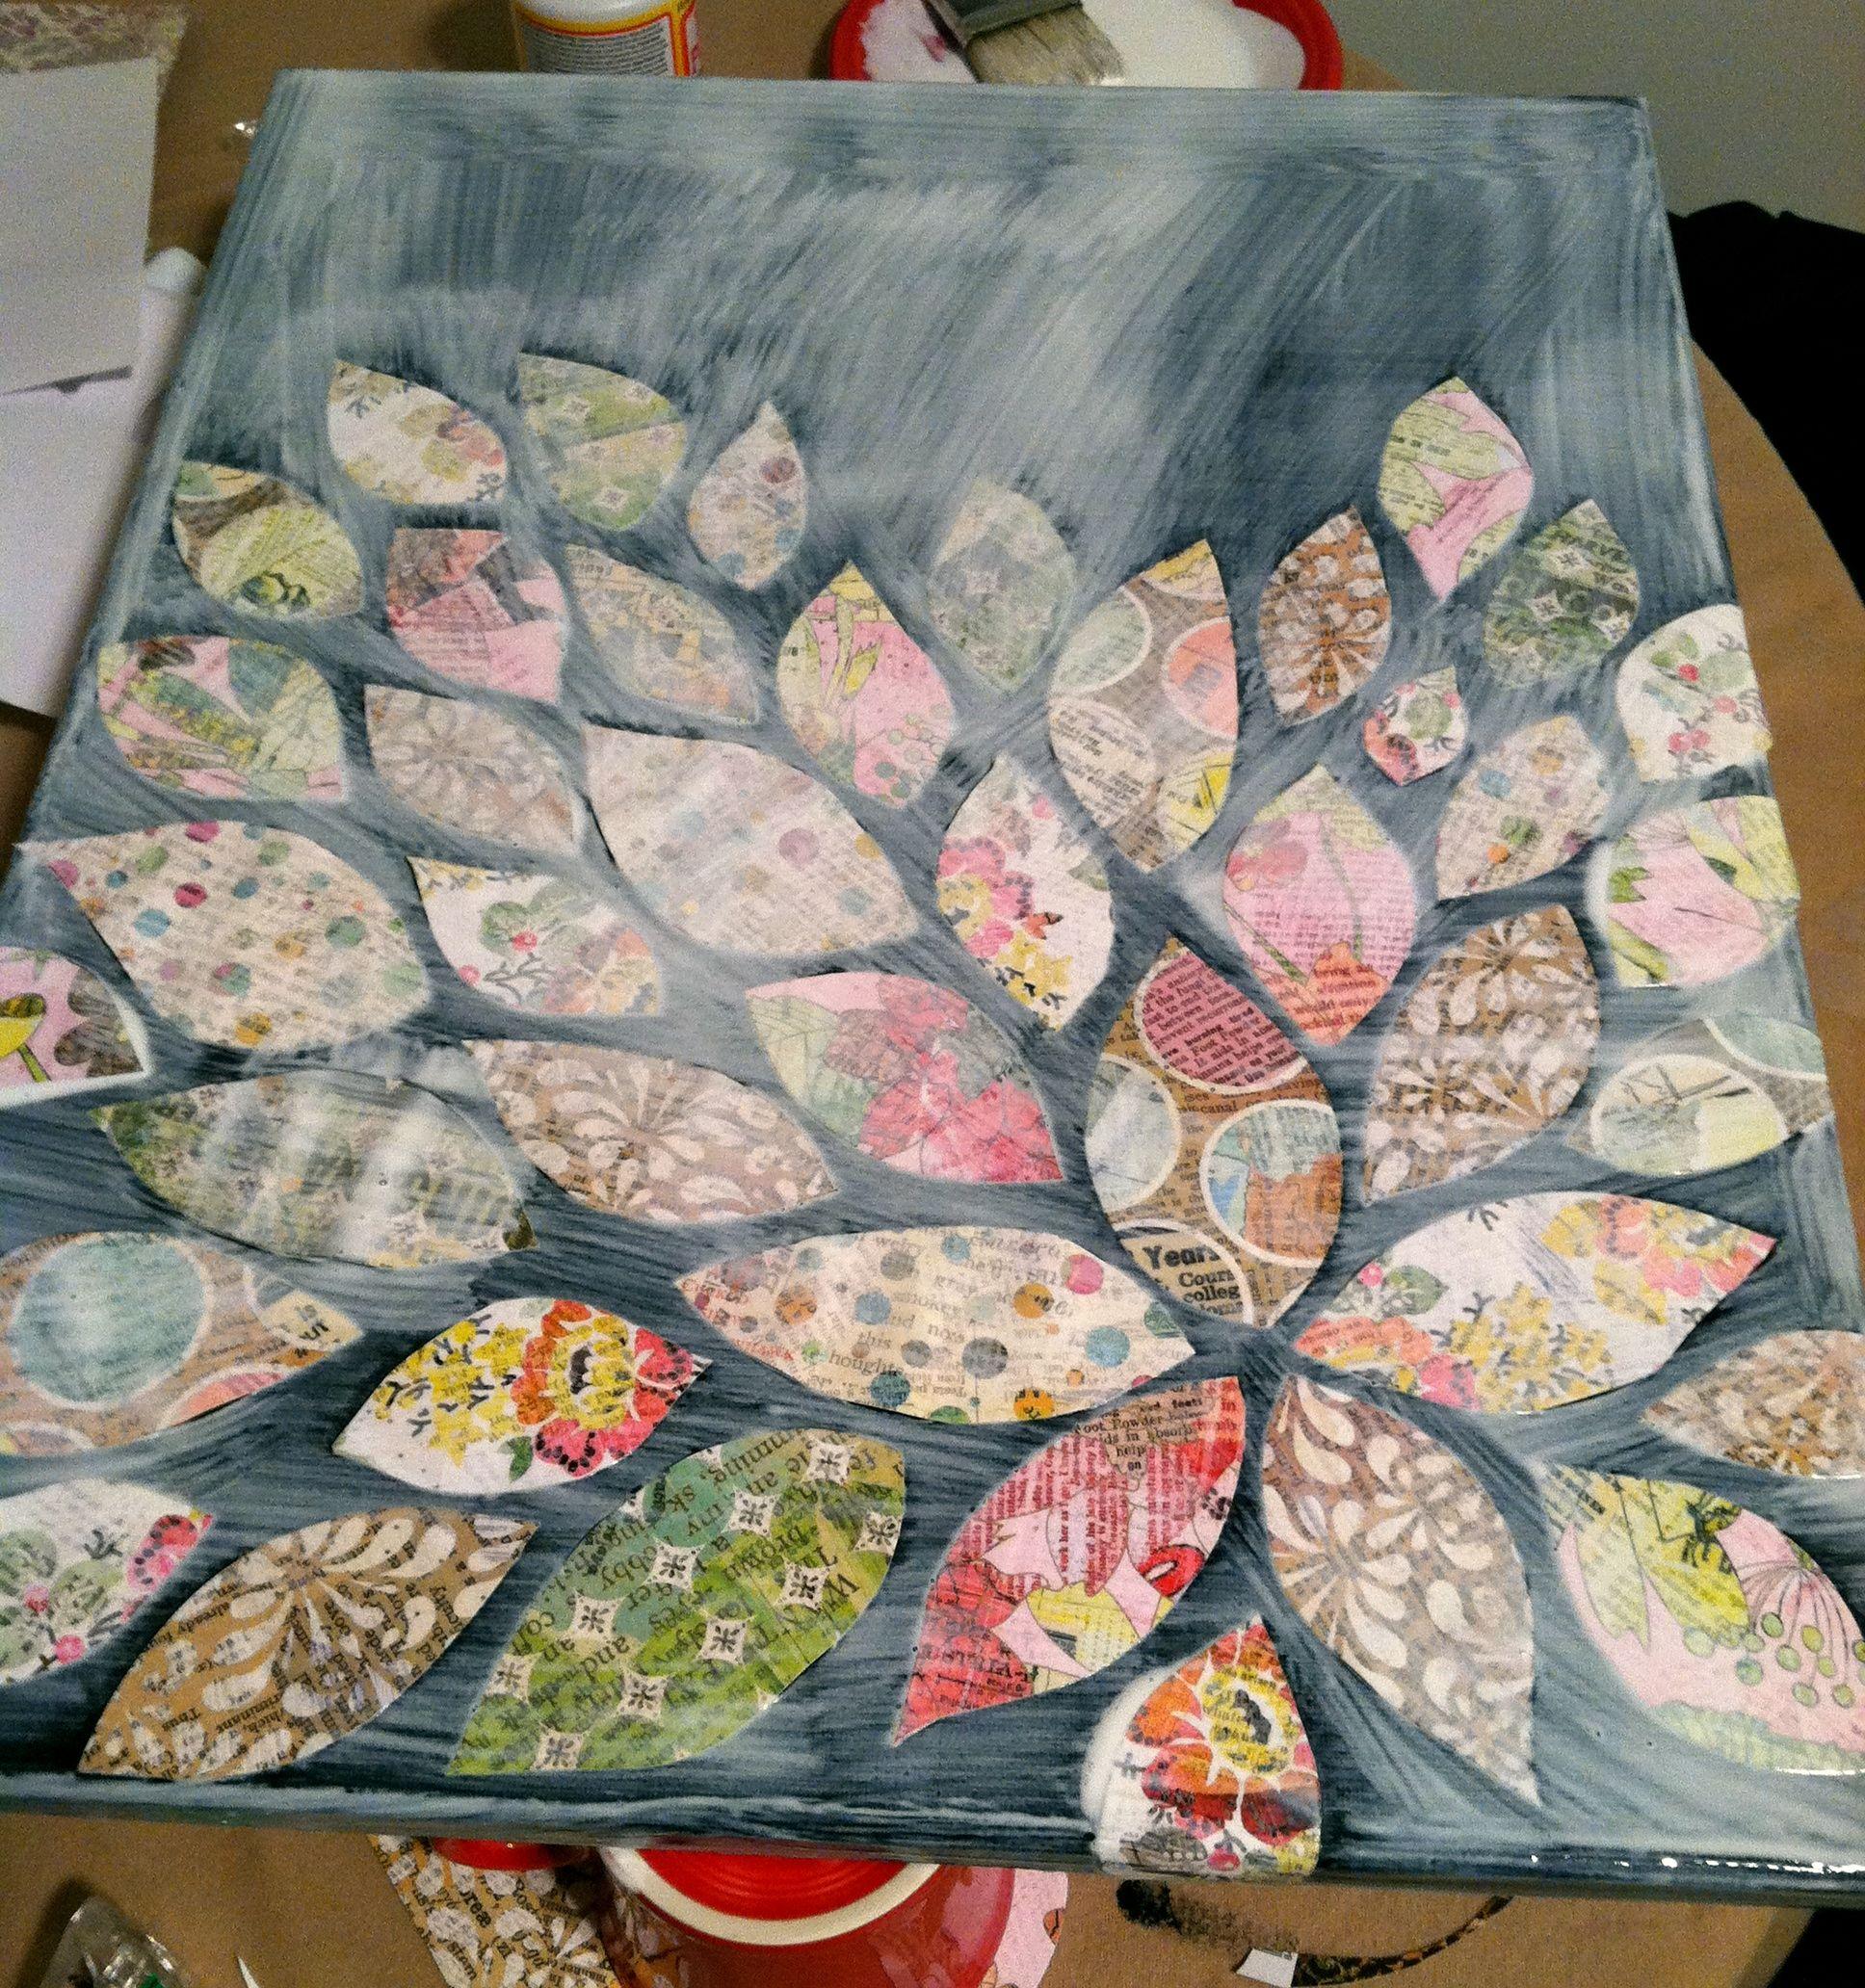 Scrapbook paper craft ideas - Mod Podge Canvas How To Creative Ideasproject Ideasart Clubchristmas Diyscrapbook Paperpapercraftdyicopyorganize